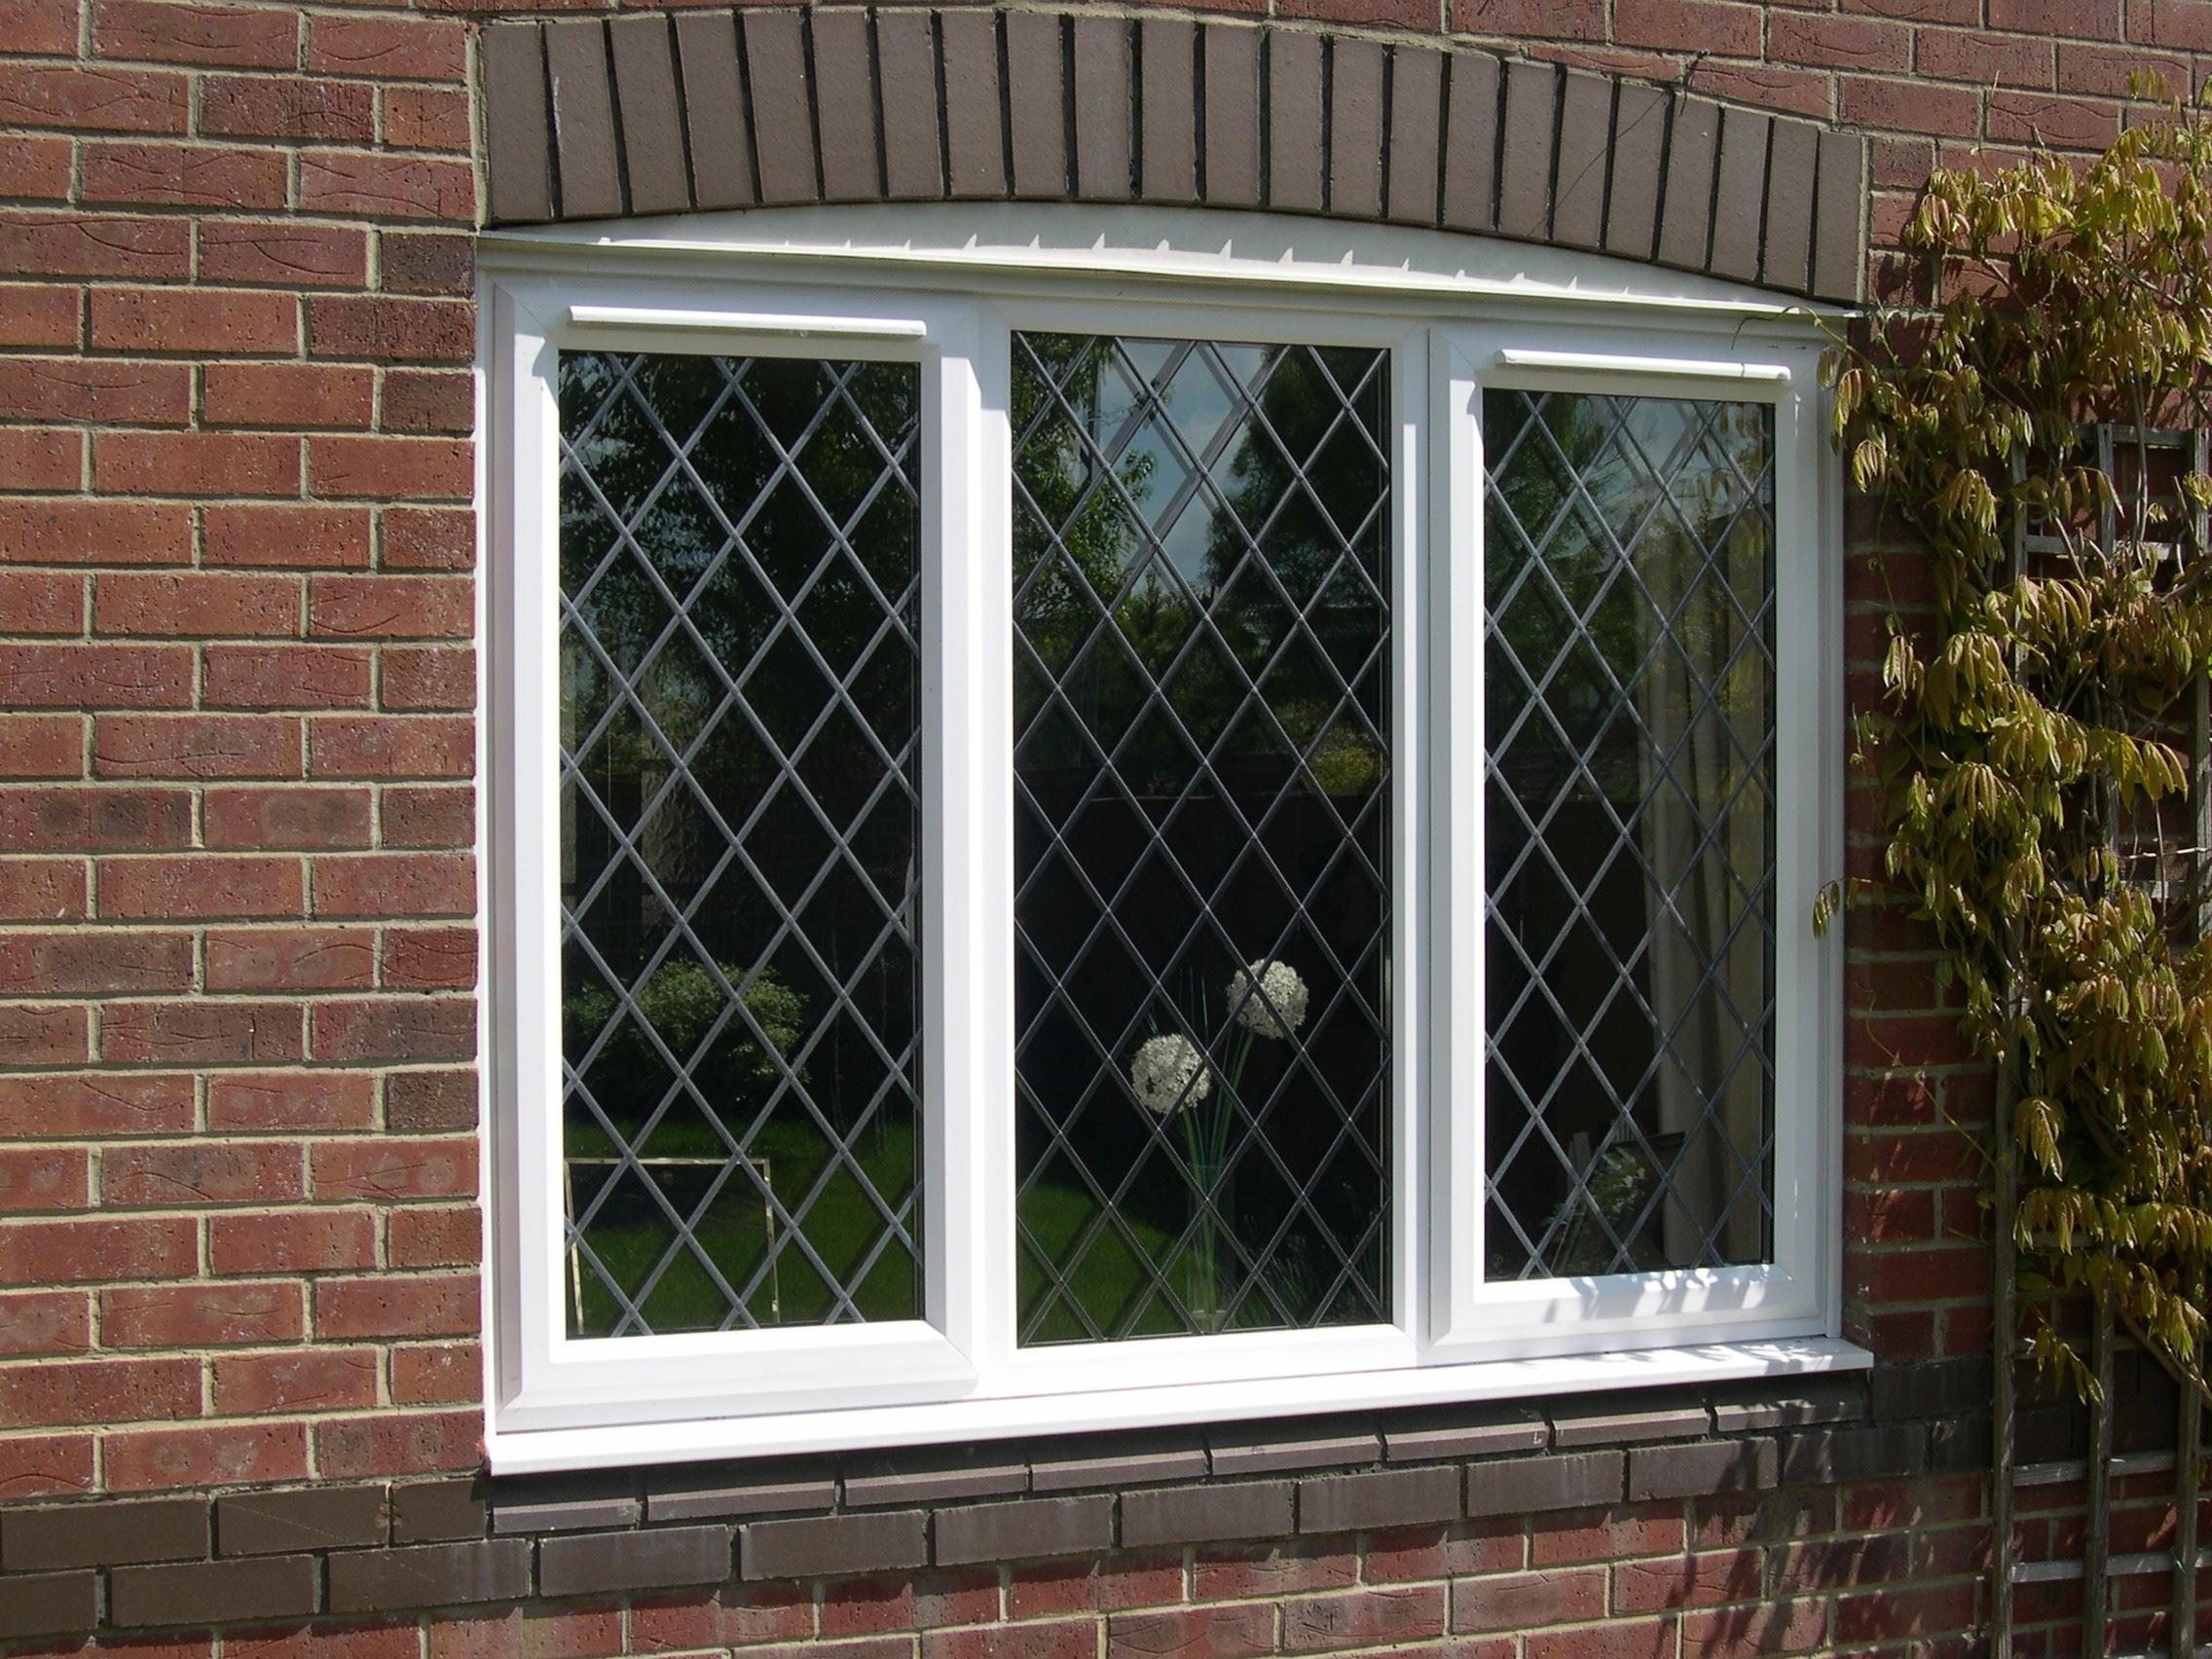 White brand new PVC window.